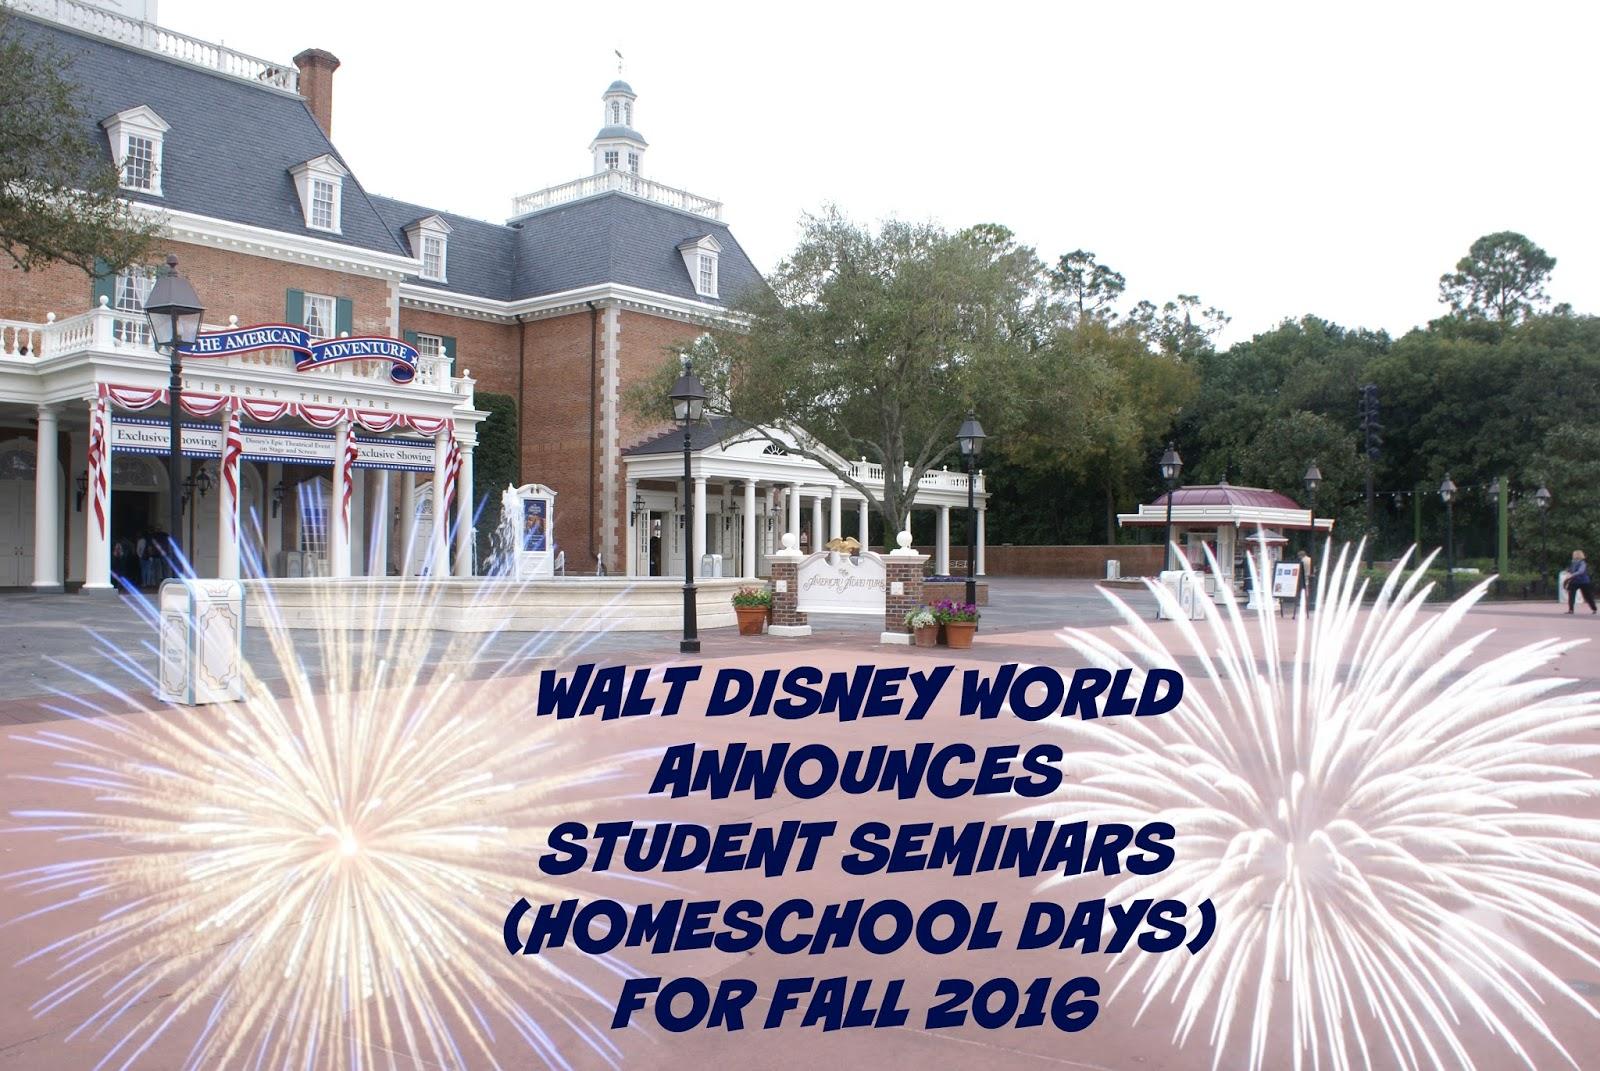 Walt Disney World Releases Homeschool Day Dates For Fall